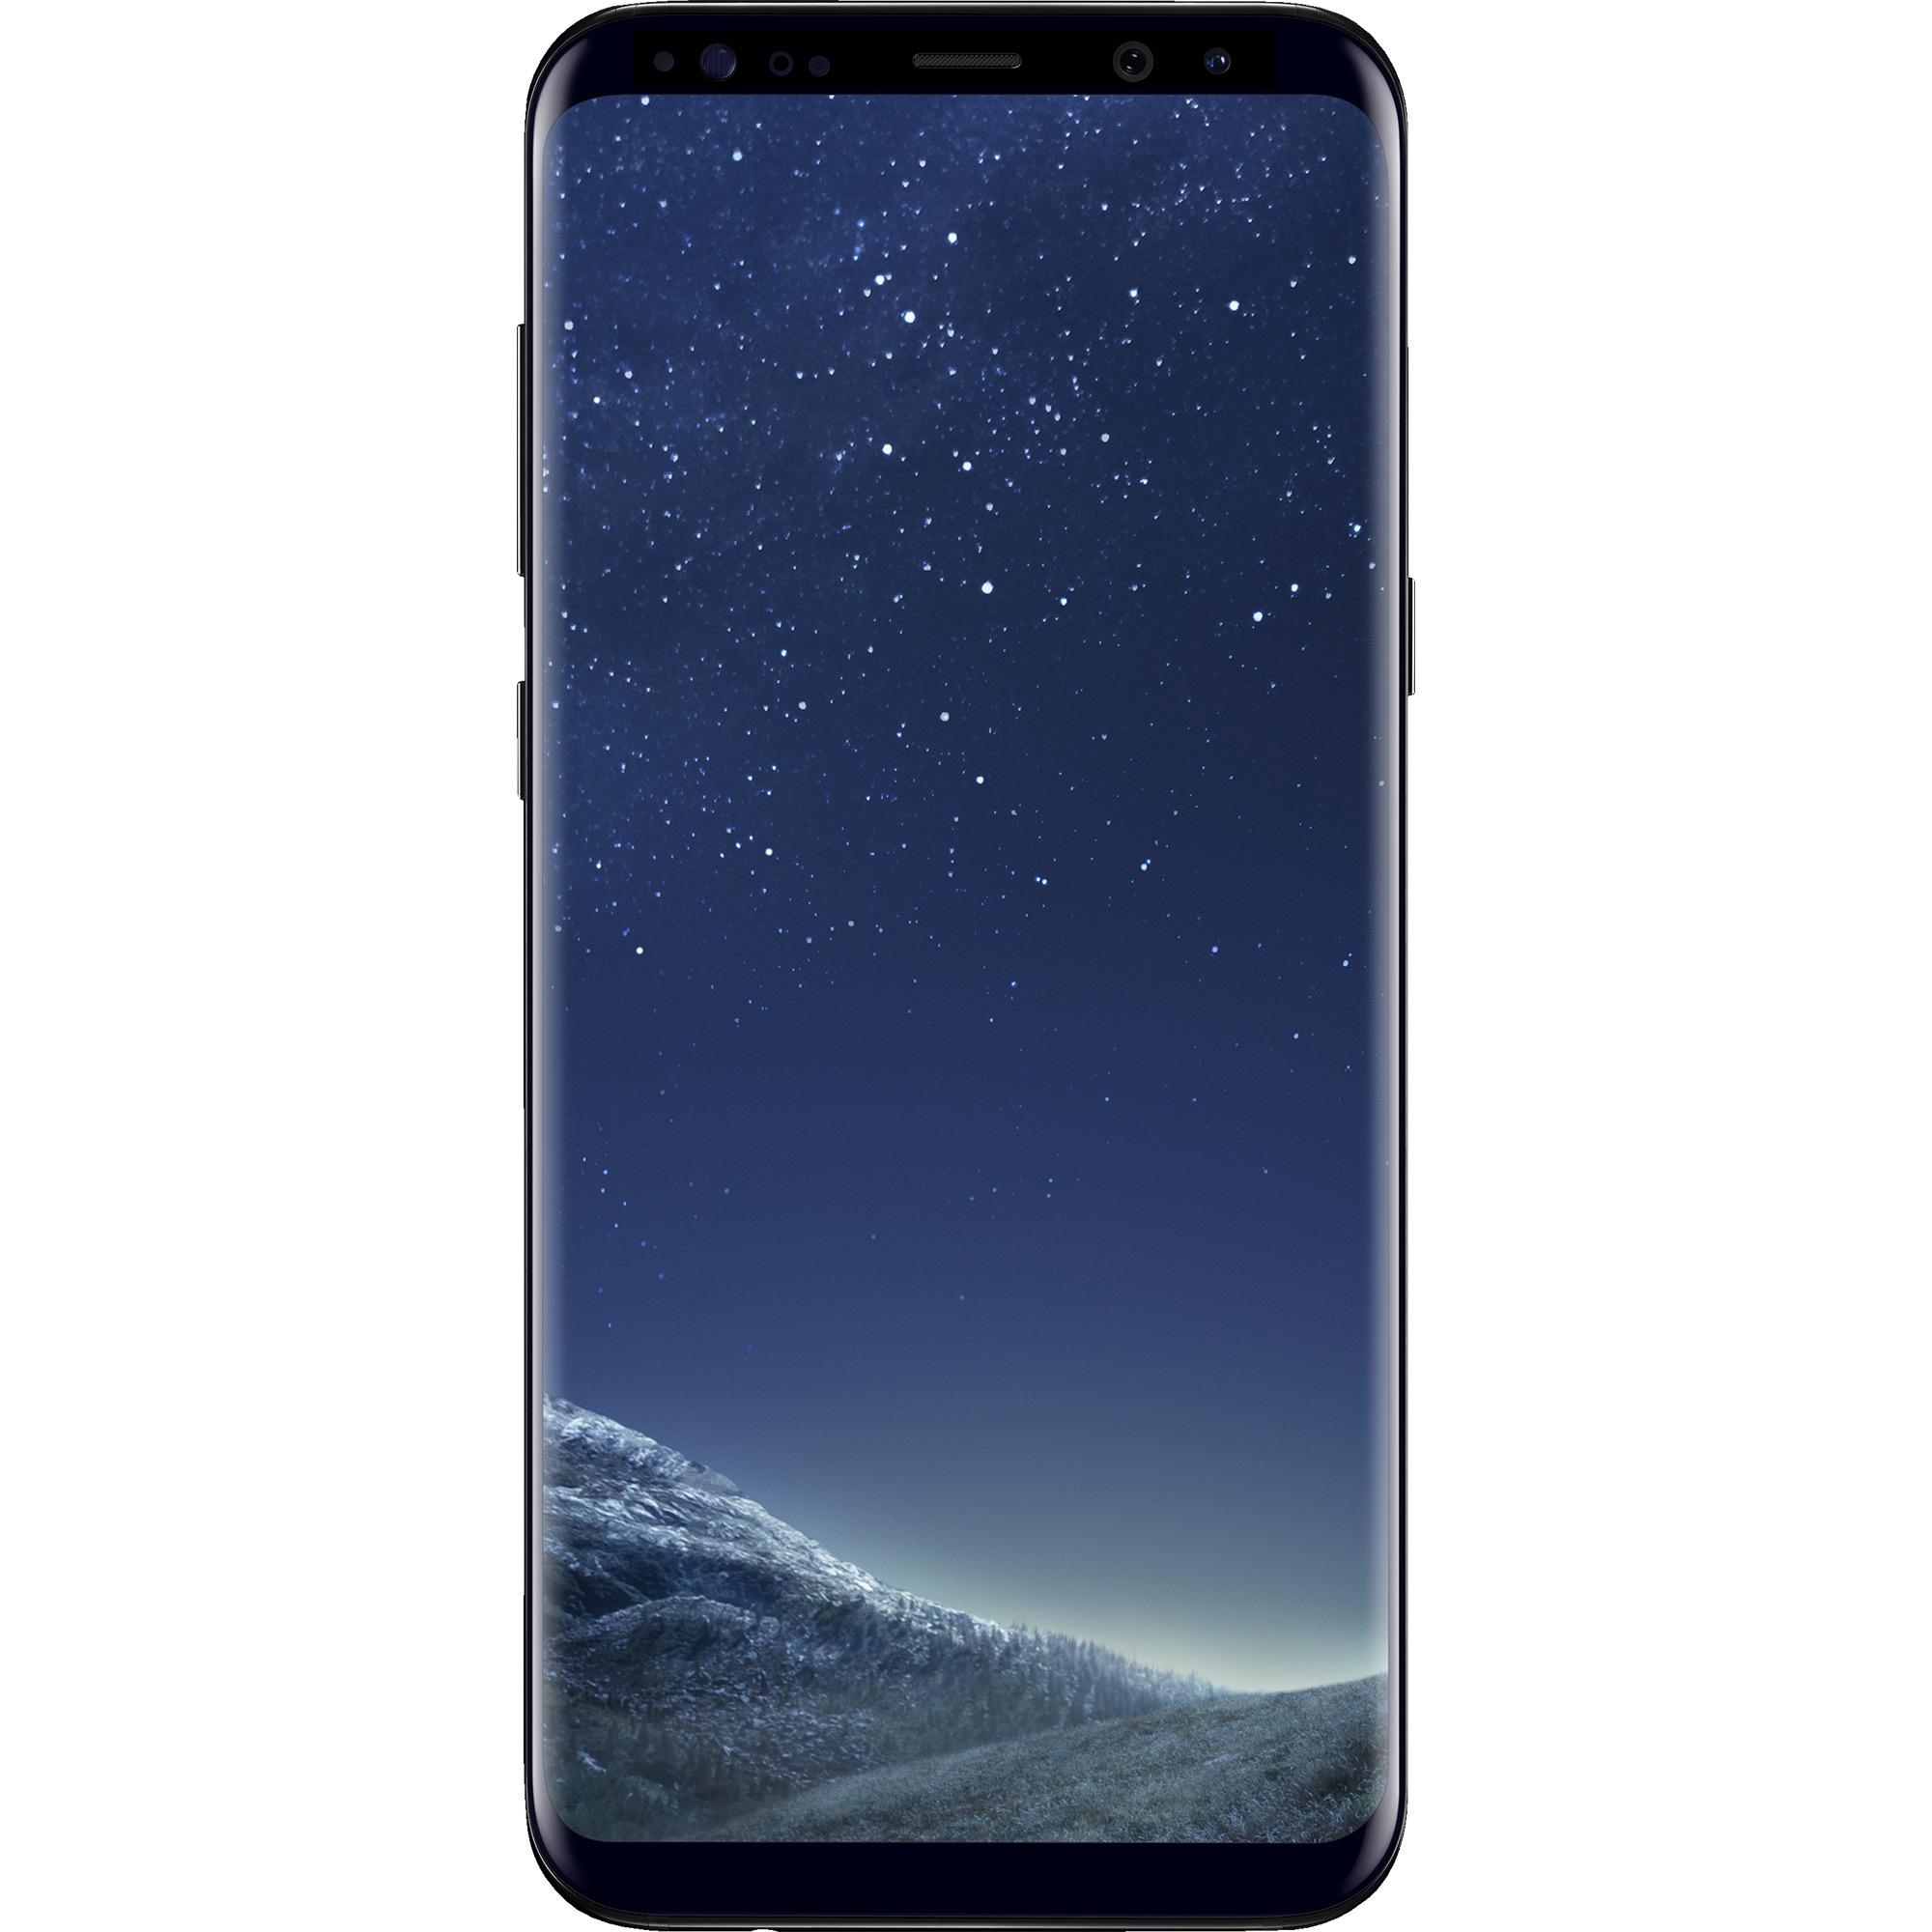 Walmart Family Mobile Samsung GS 8+ Prepaid Smartphone, Black